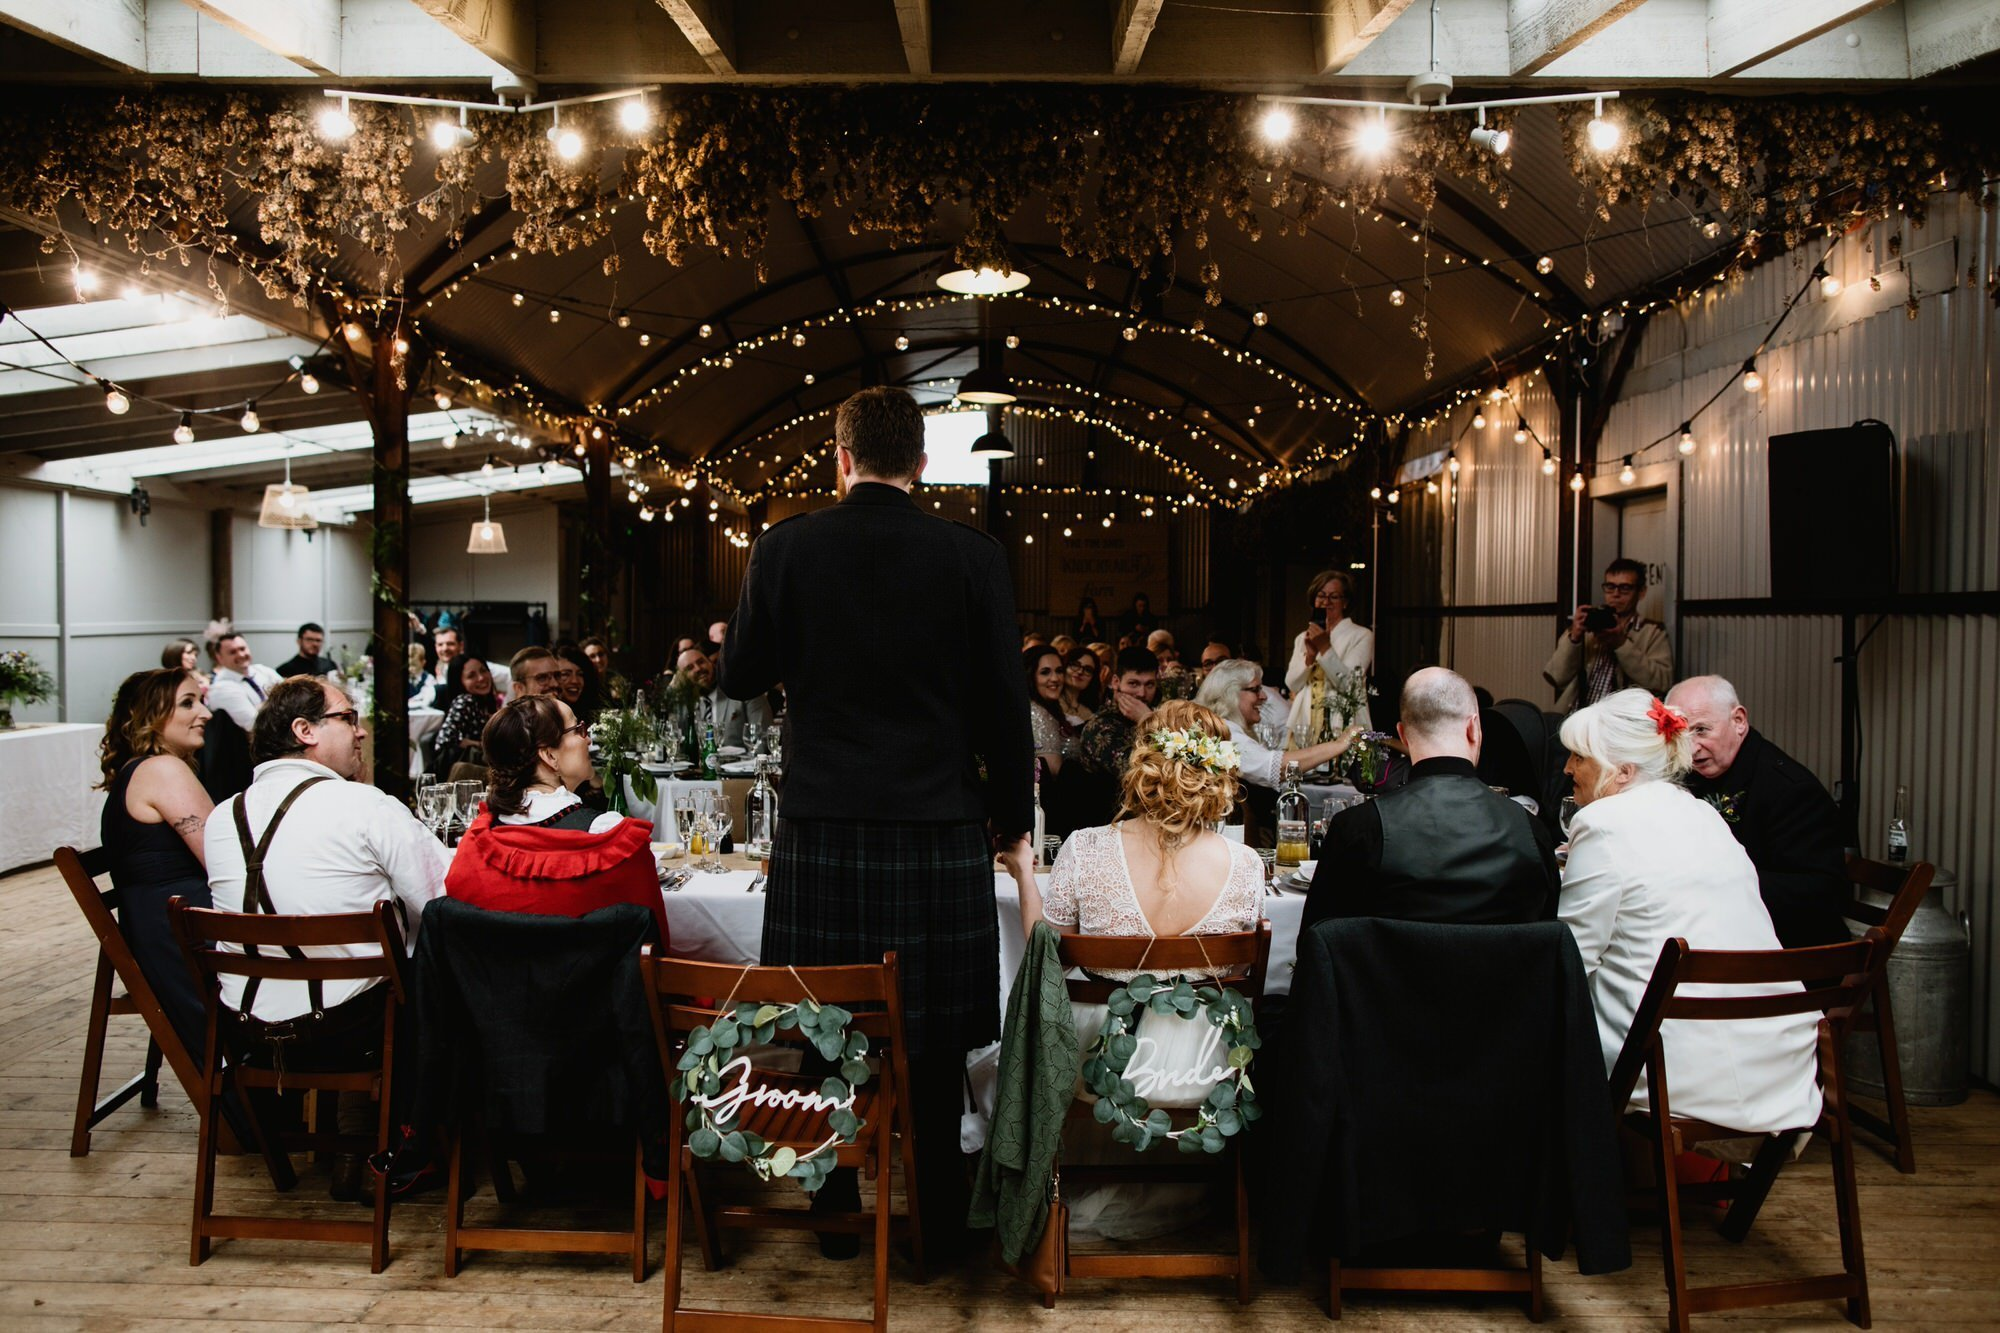 044 WEDDING SPEECHES TIN SHED KNOCKRAICH TOP TABLE AUSTRIAN SCOTTISH ZOE ALEXANDRA PHOTOGRAPHY